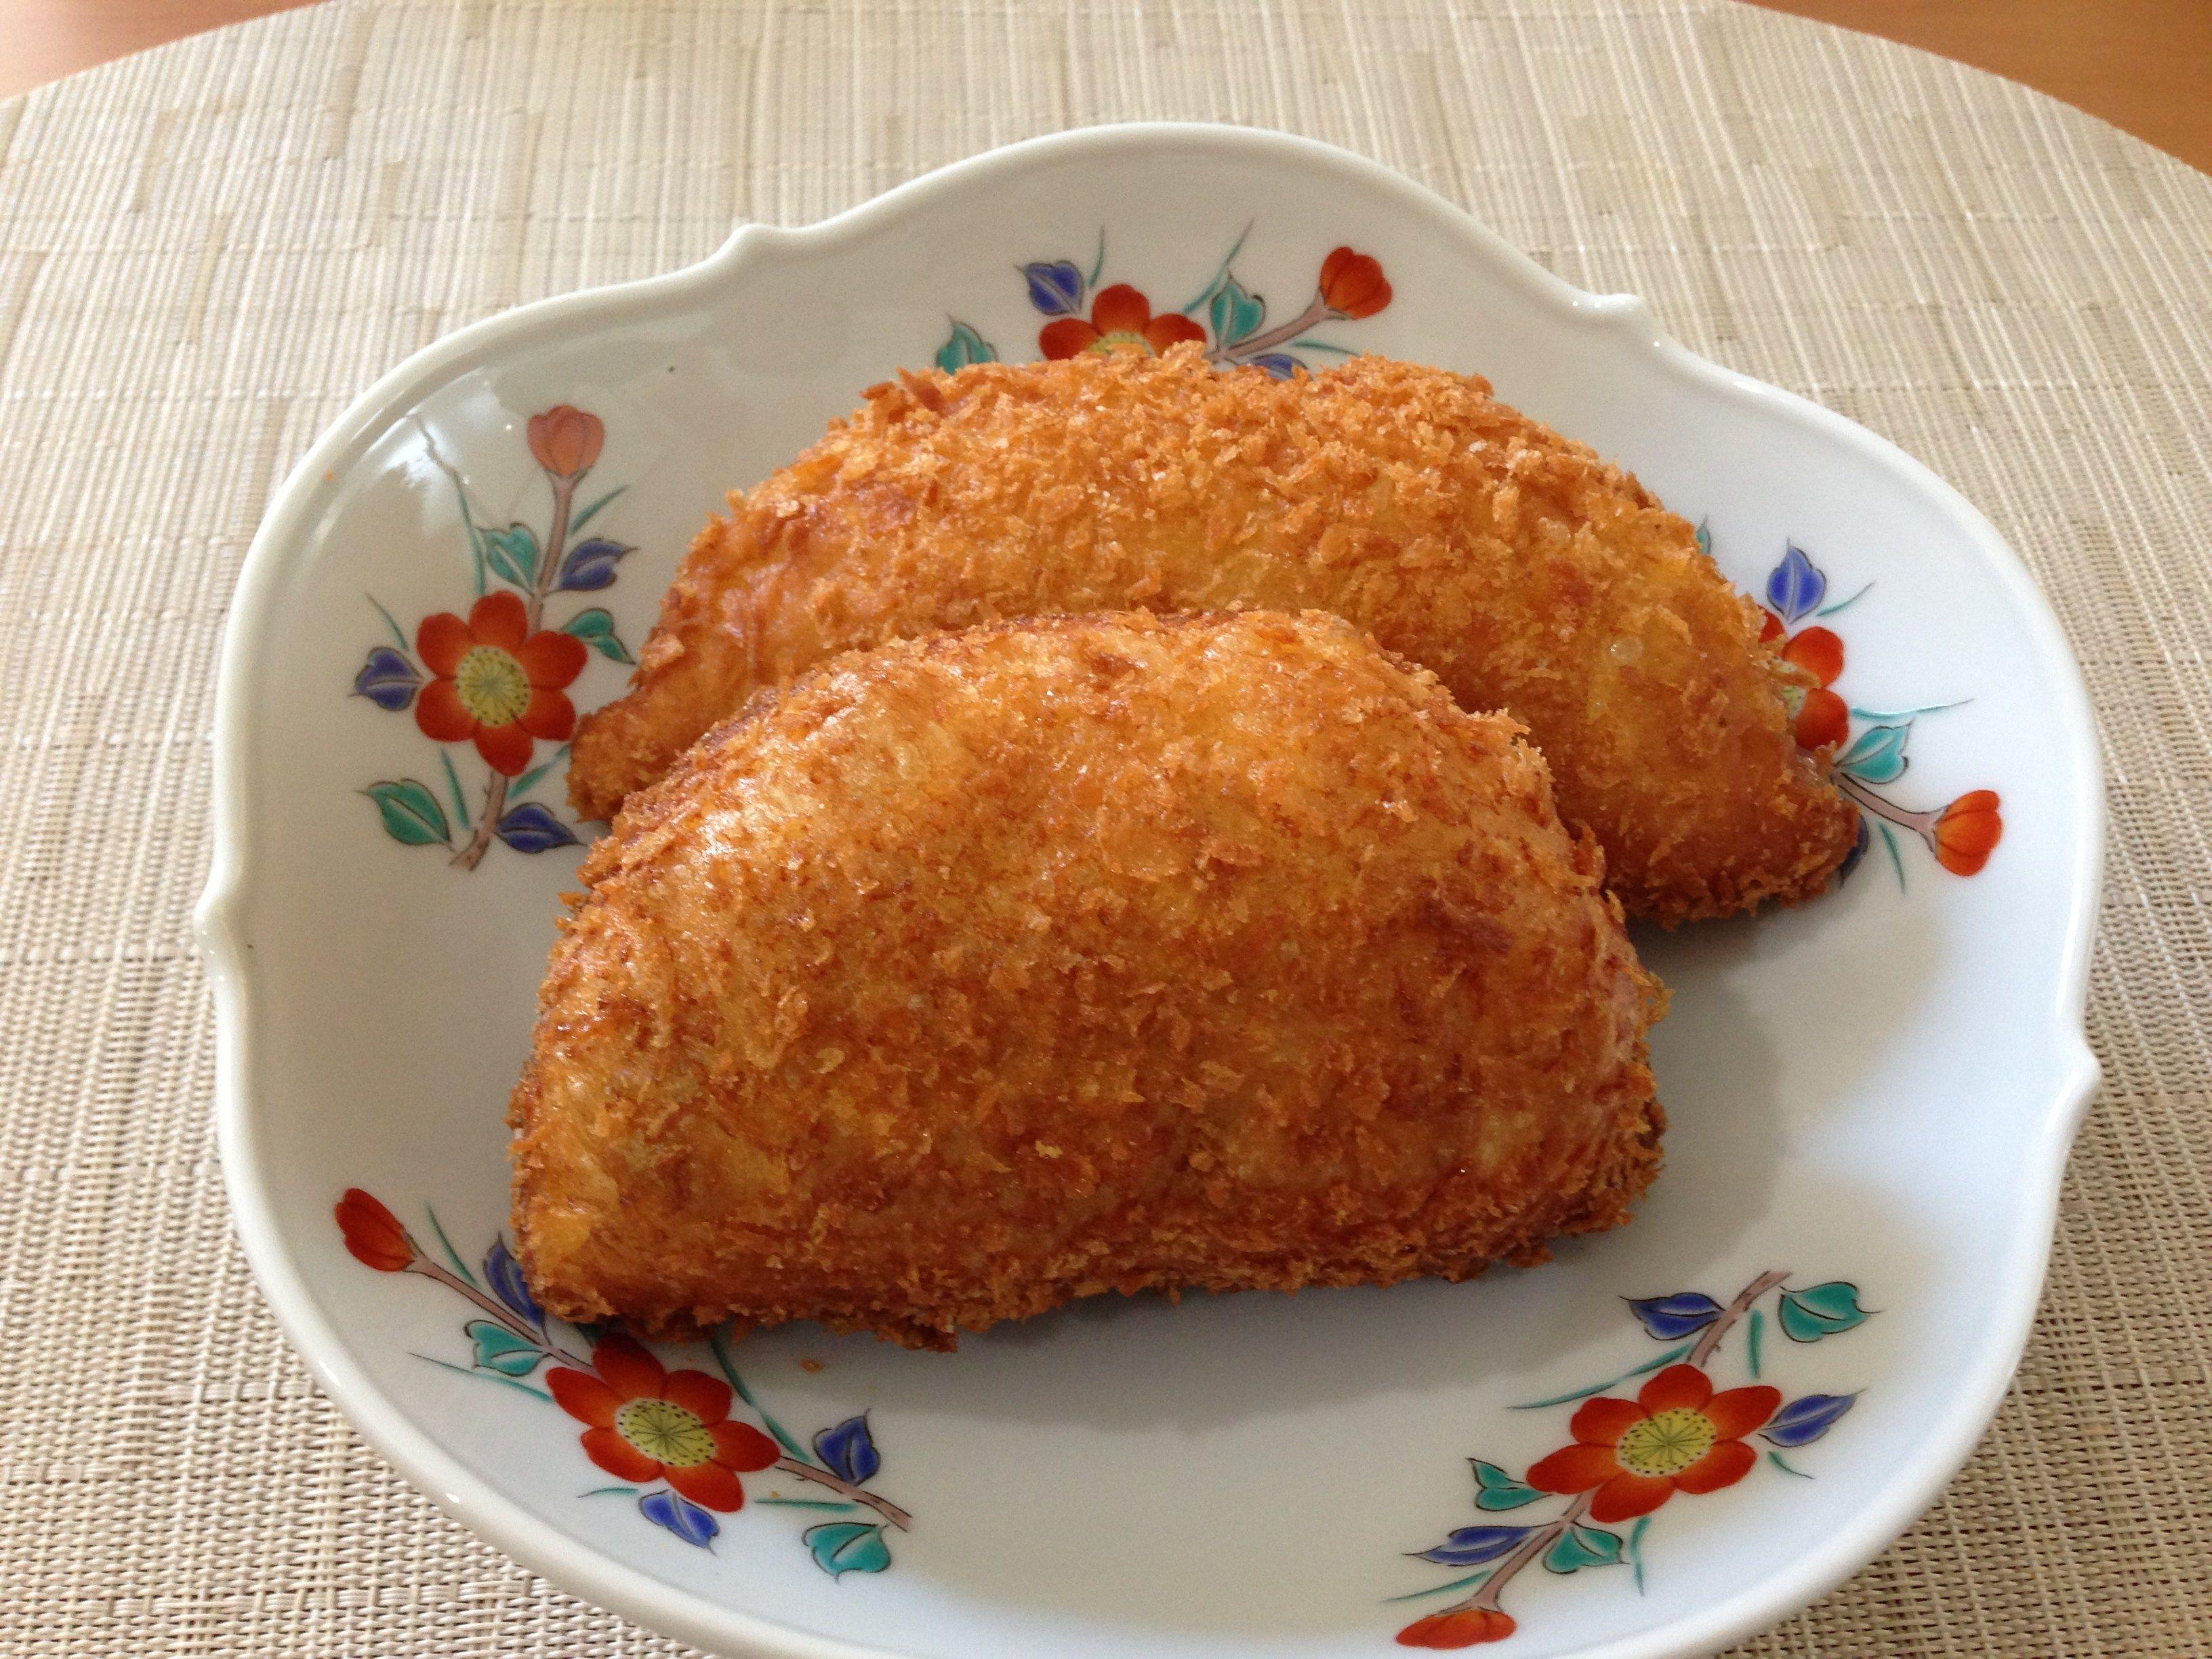 Kare Pan Recipe How To Make Japanese Curry Bread Curry Bun Japanese Cookbook Japanese Recipes From Mari S Tokyo Curry Bread Kare Pan Recipe Curry Buns